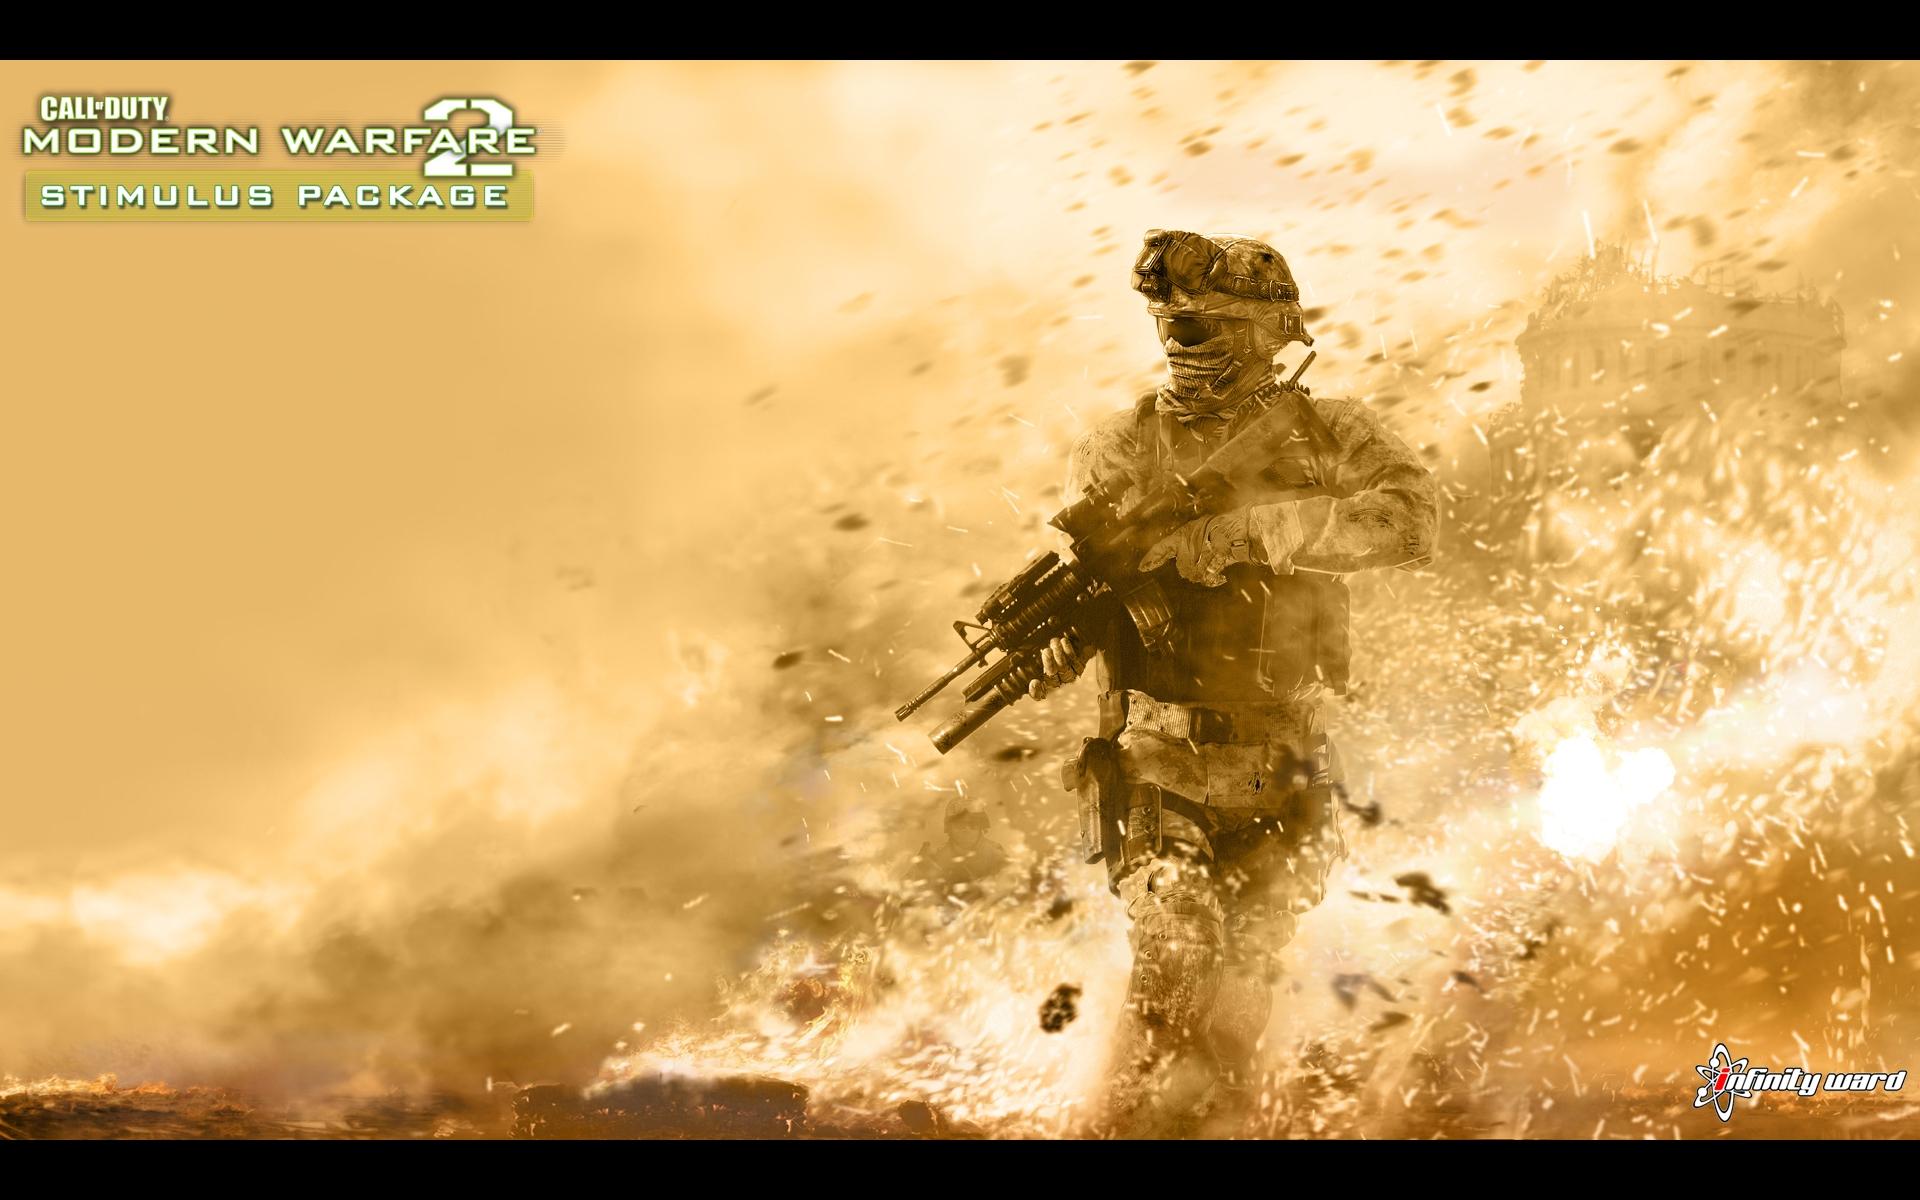 Call Of Duty Modern Warfare 2 Wallpaper Hd 1920x1200 Wallpaper